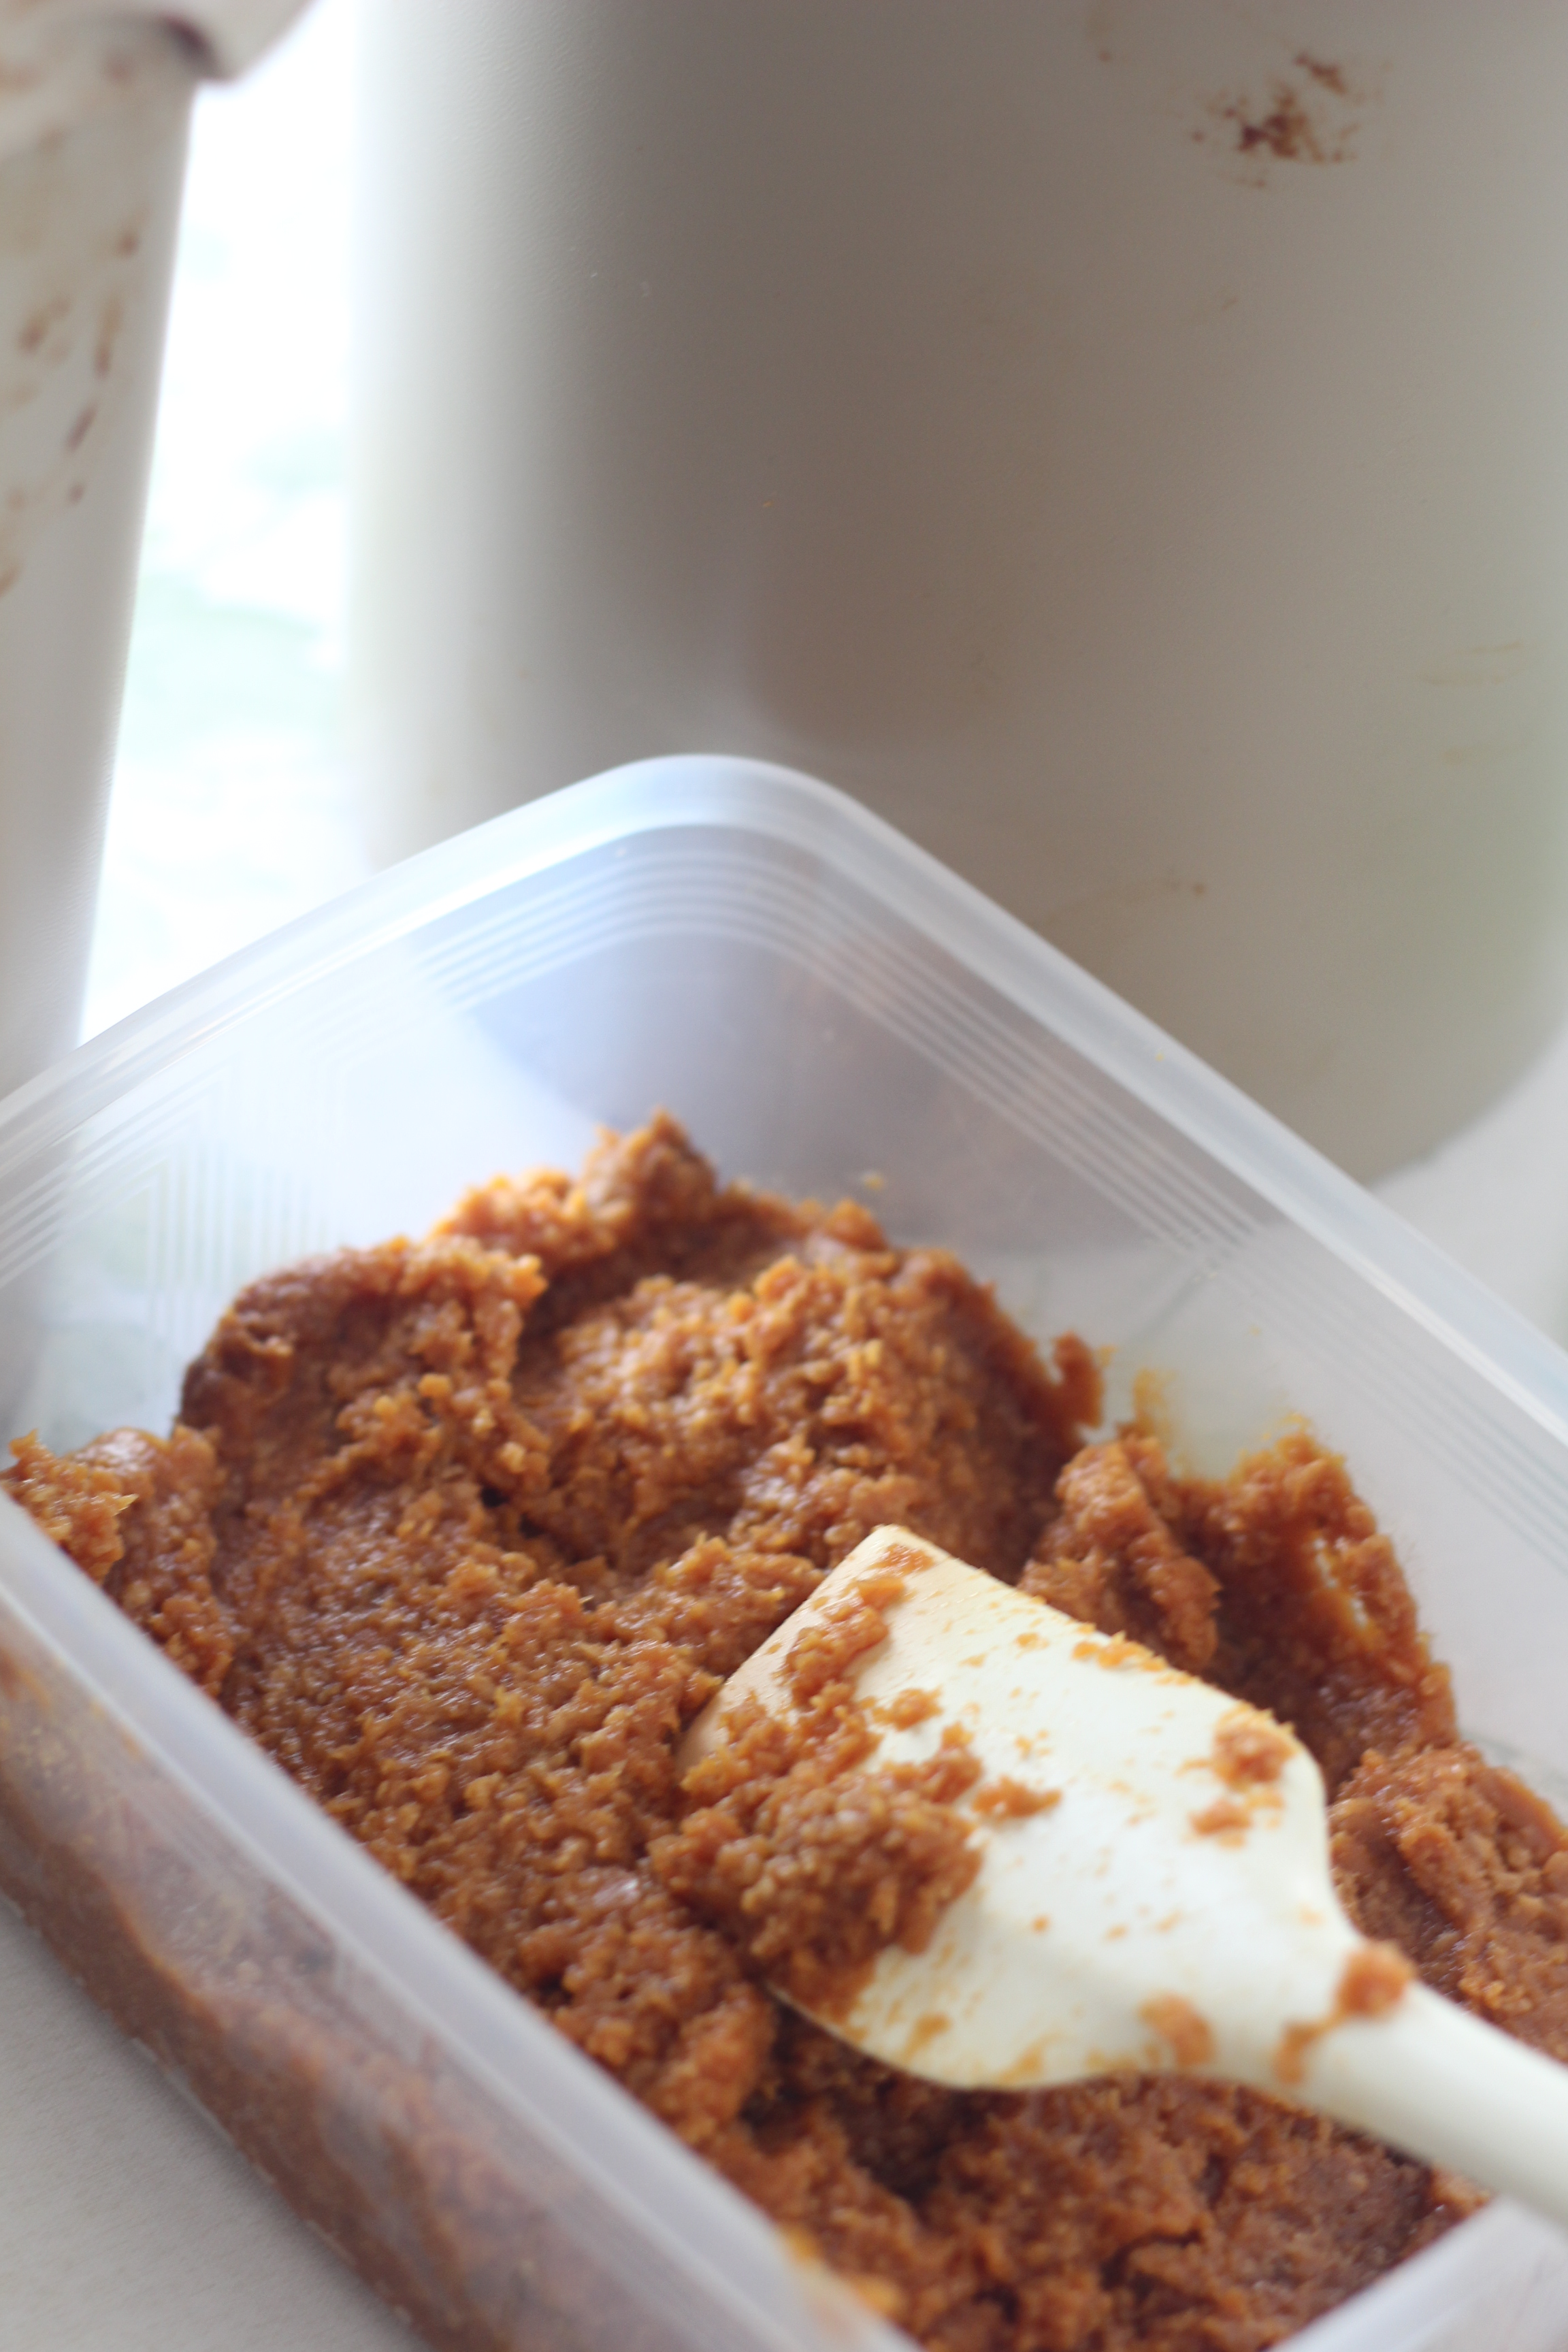 a-ta-sante糖質制限パン料理教室、阿倍野区西田辺。お味噌の小分け。